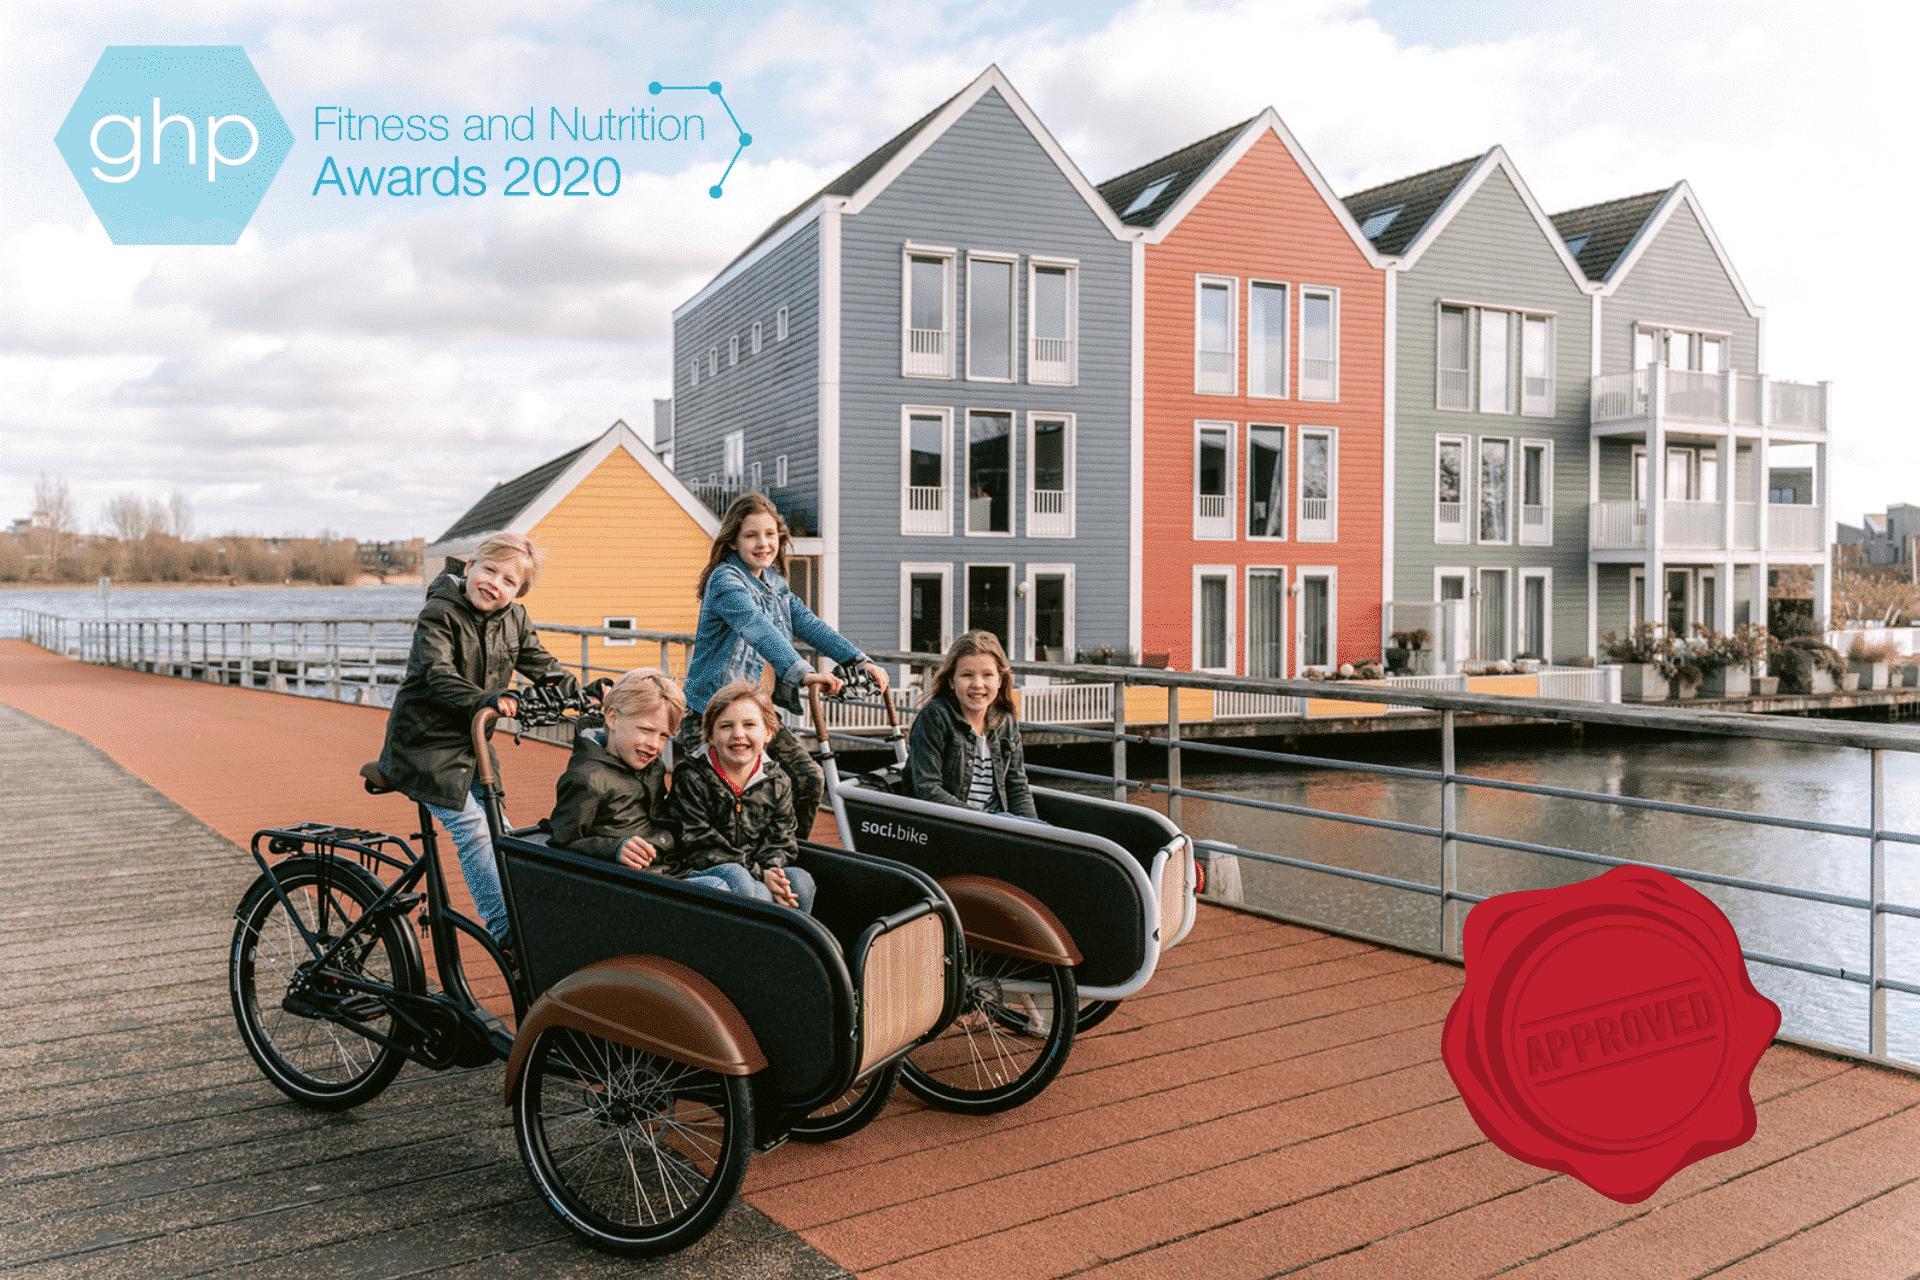 soci.bike Beste fabrikant van elektrische bakfietsen - West-Europa